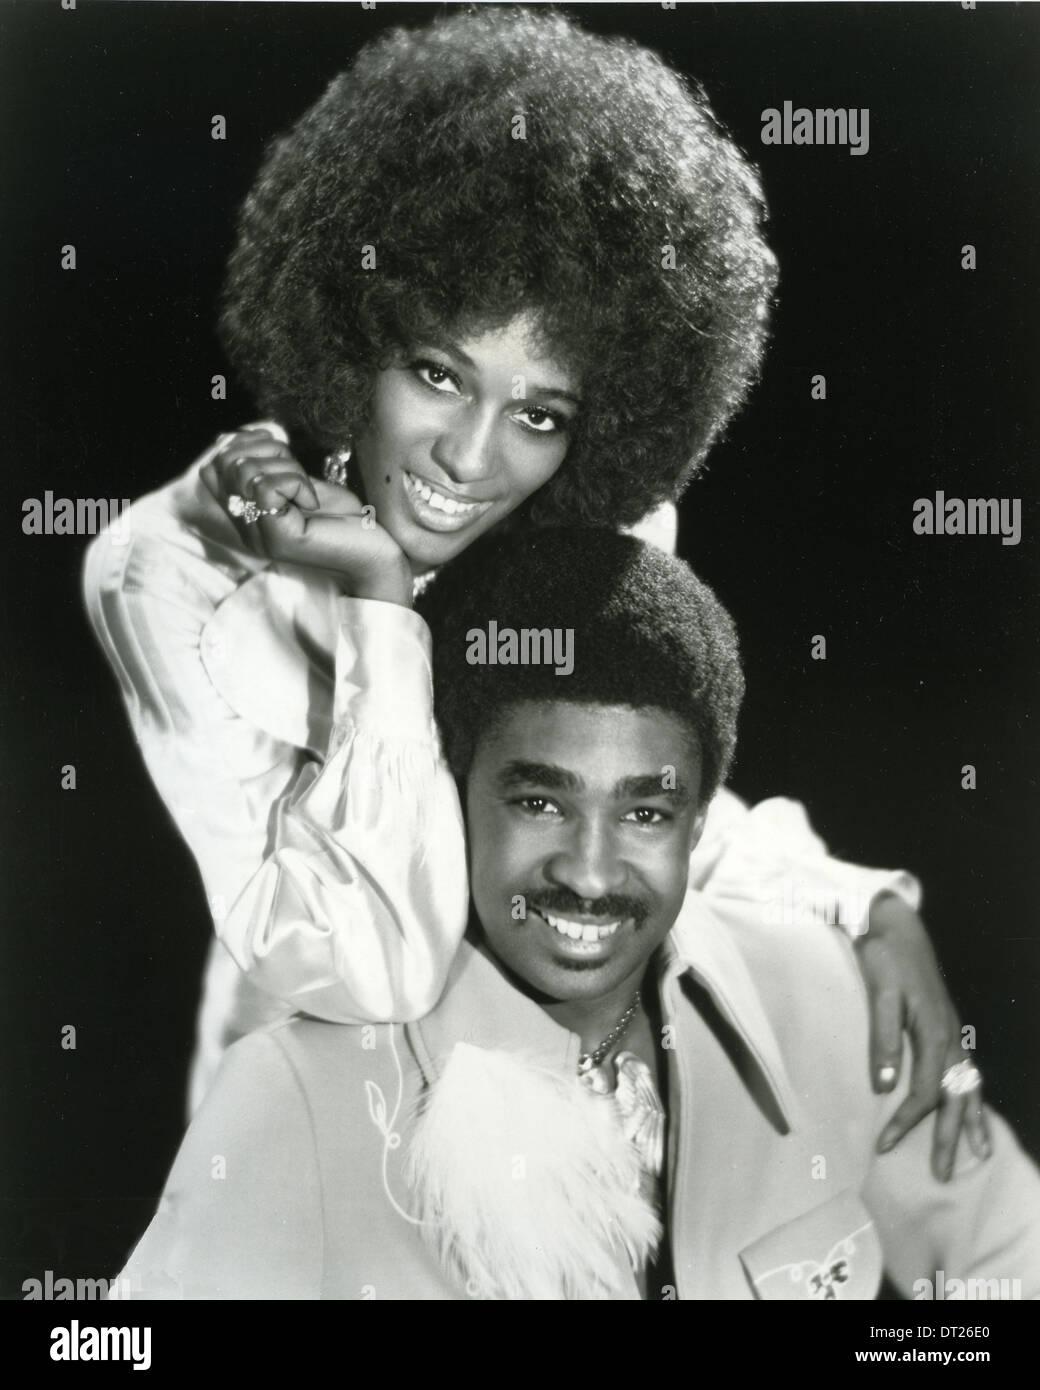 Soul Singers Stock Photos & Soul Singers Stock Images - Alamy